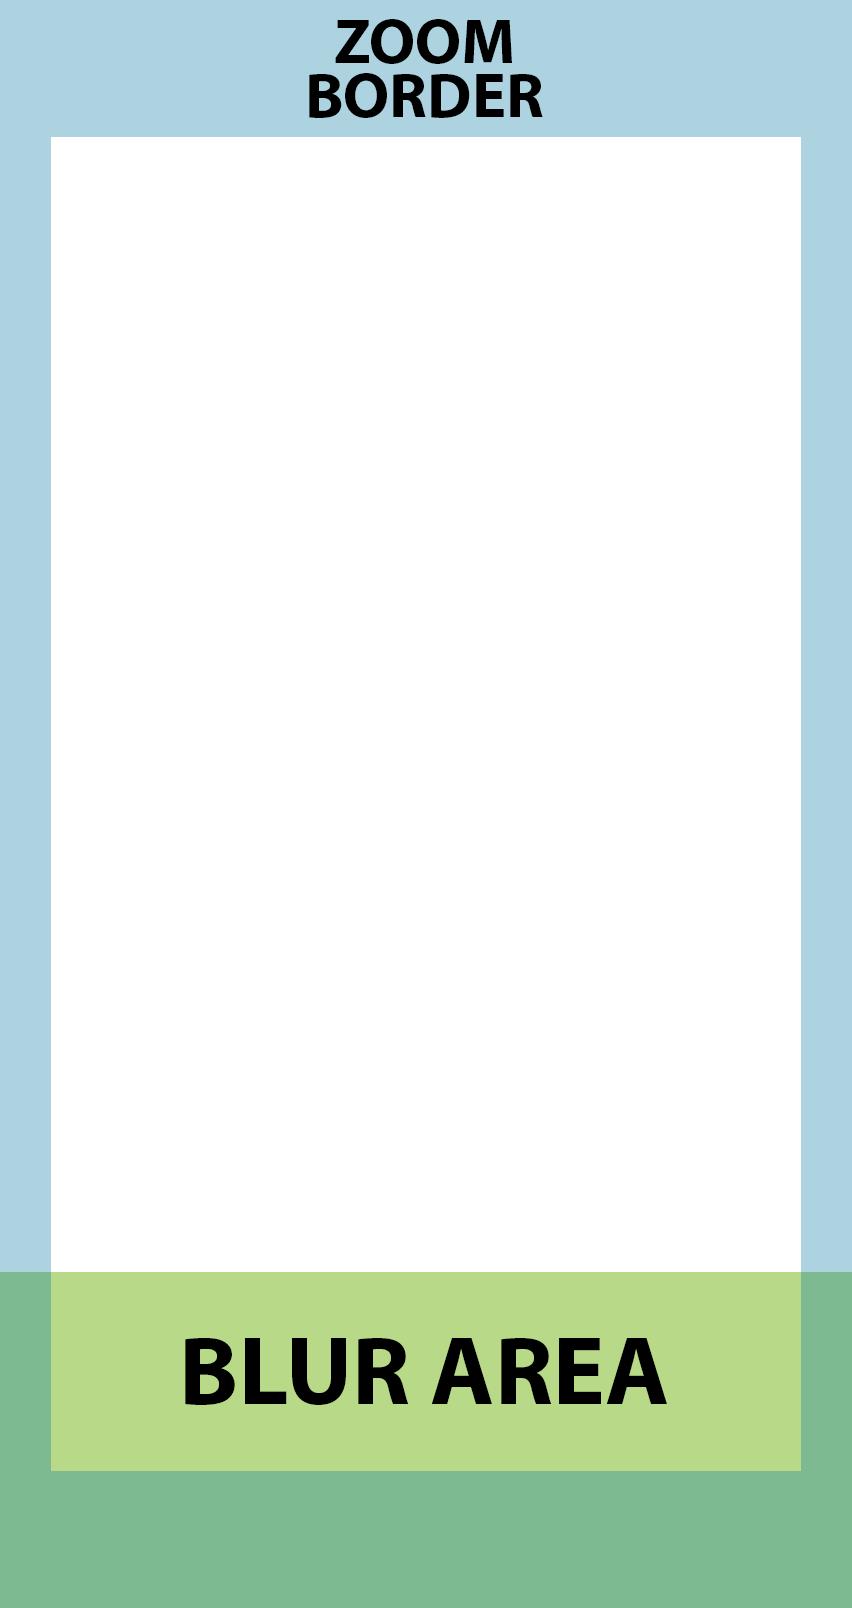 49 Iphone 6 Wallpaper Template Psd On Wallpapersafari